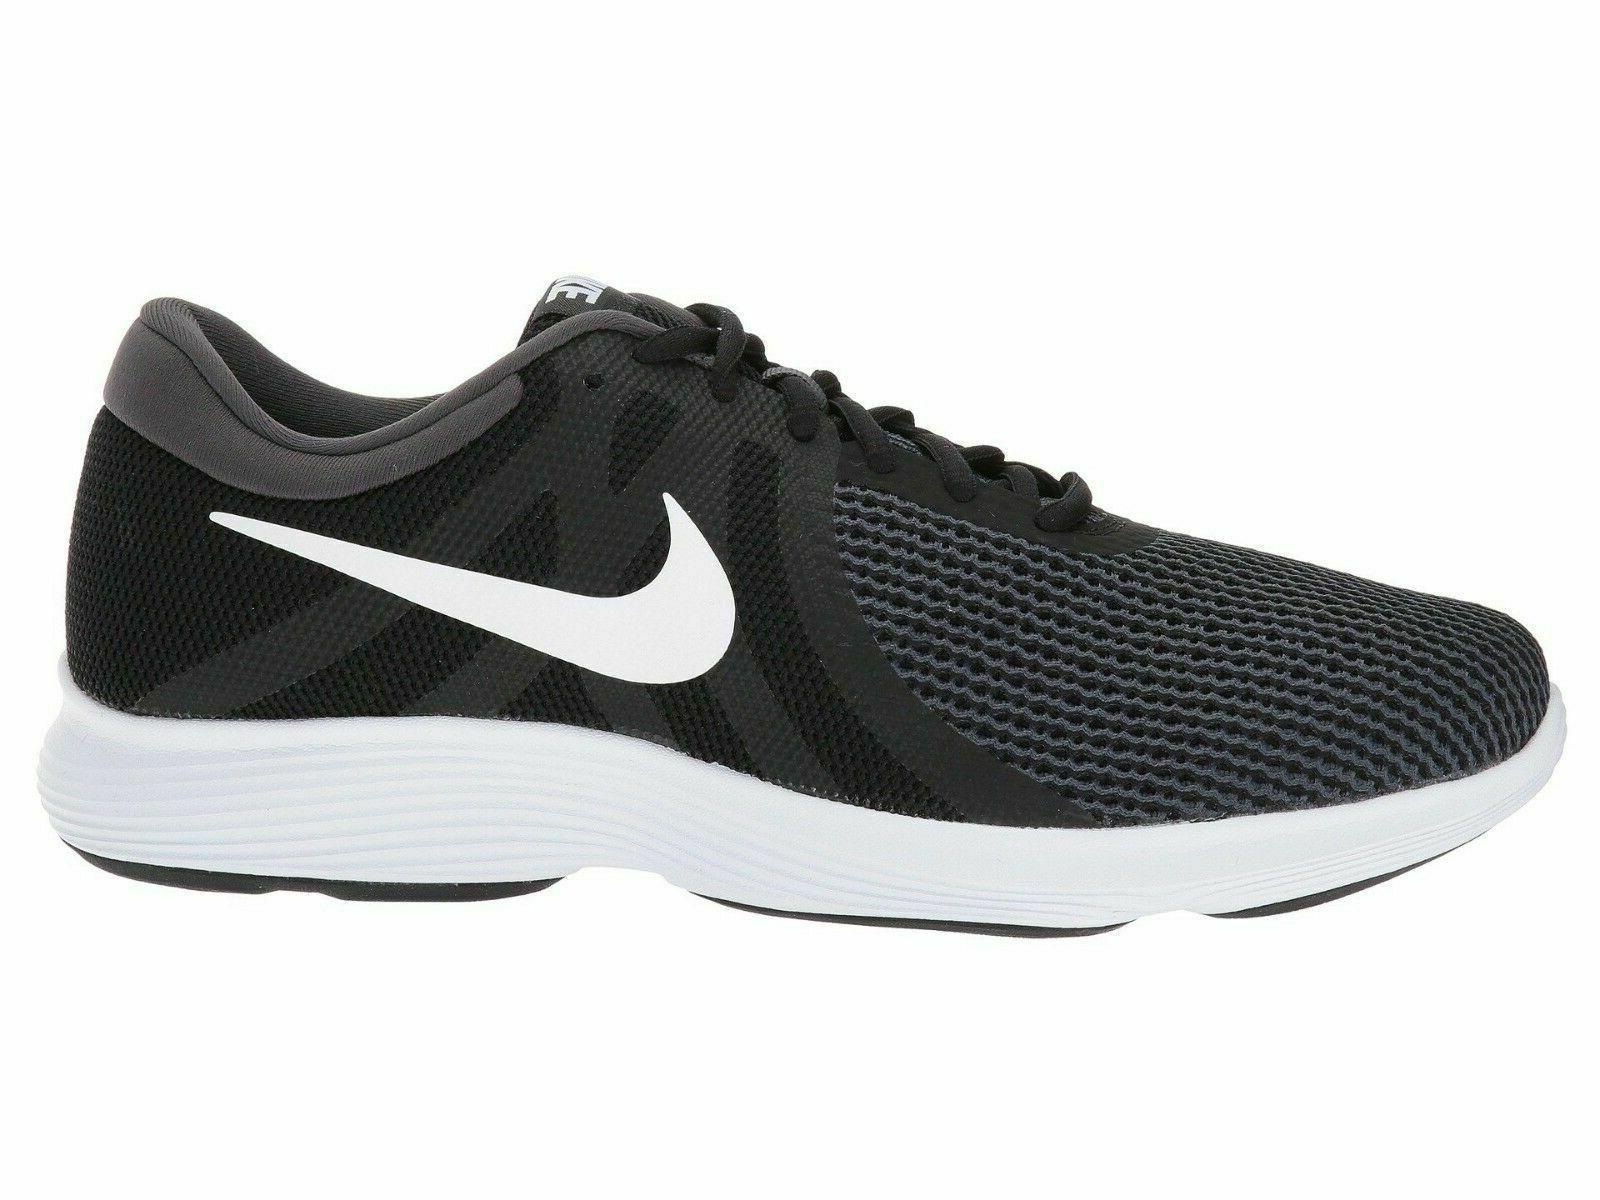 Nike Revolution Shoes Black White 908988-001 Men's NEW